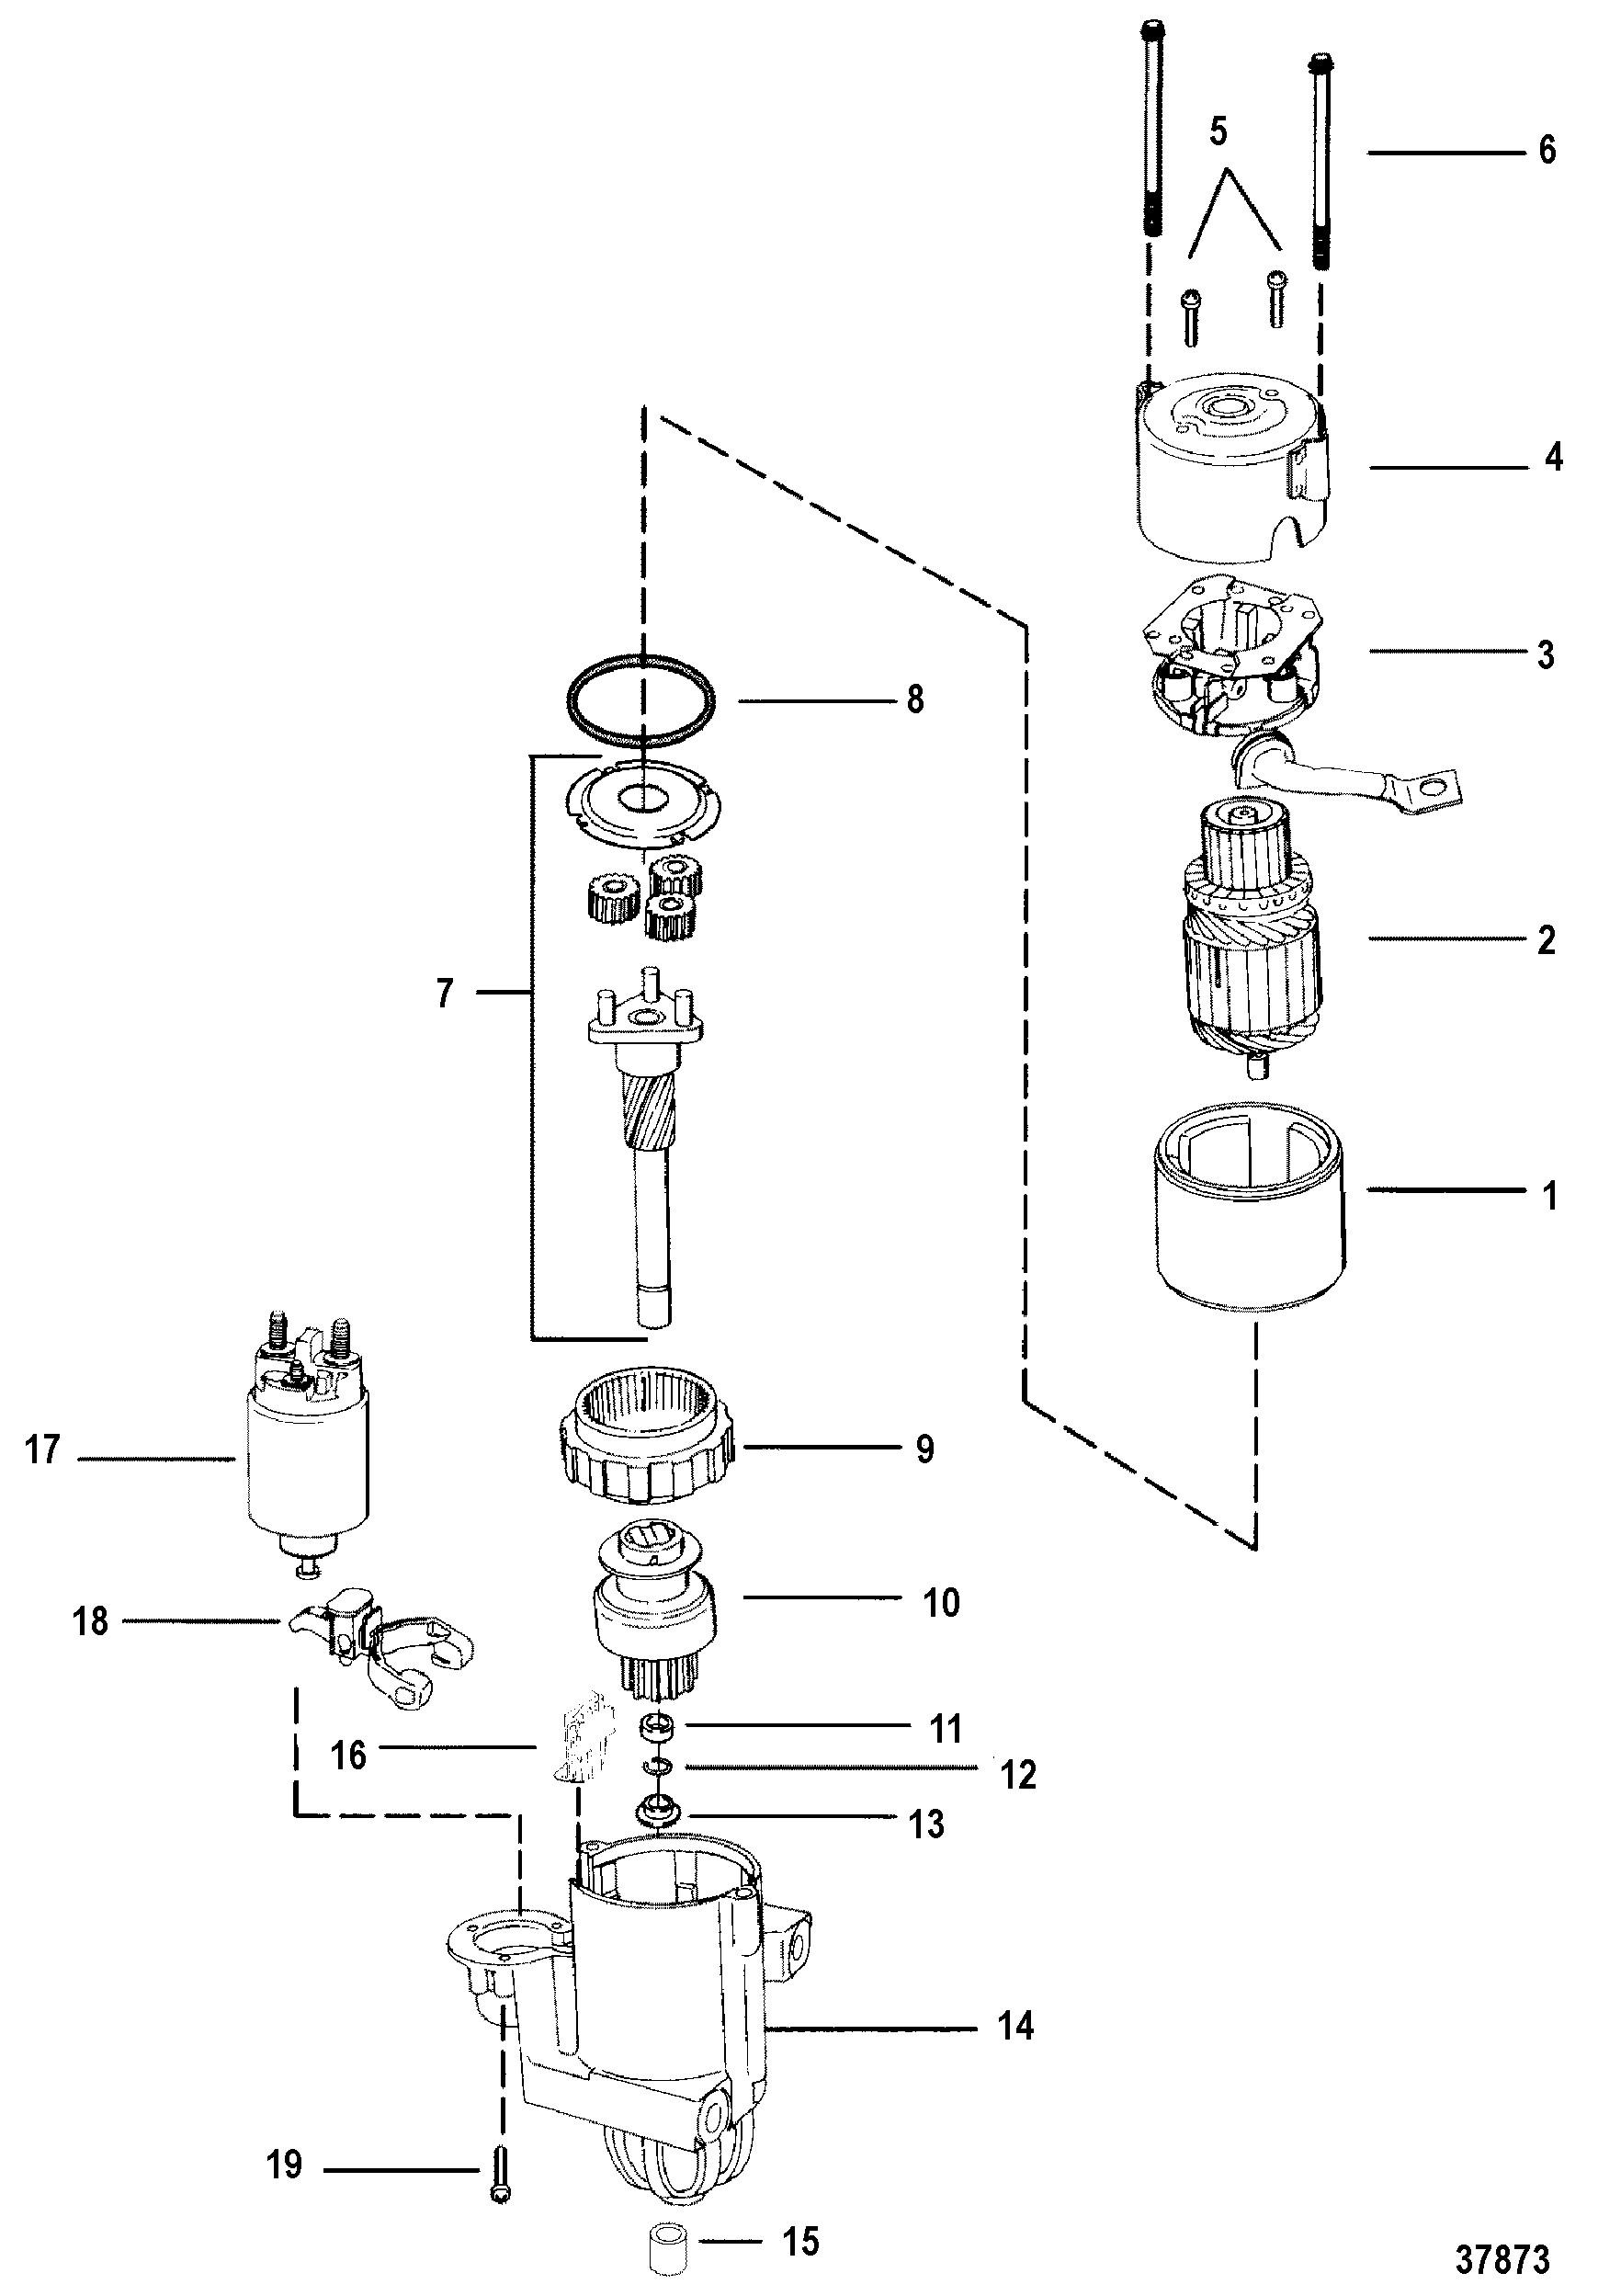 hight resolution of engine diagram 4 3 l mercruiser thunderbolt wiring library 4 3 mercruiser engine diagram my wiring